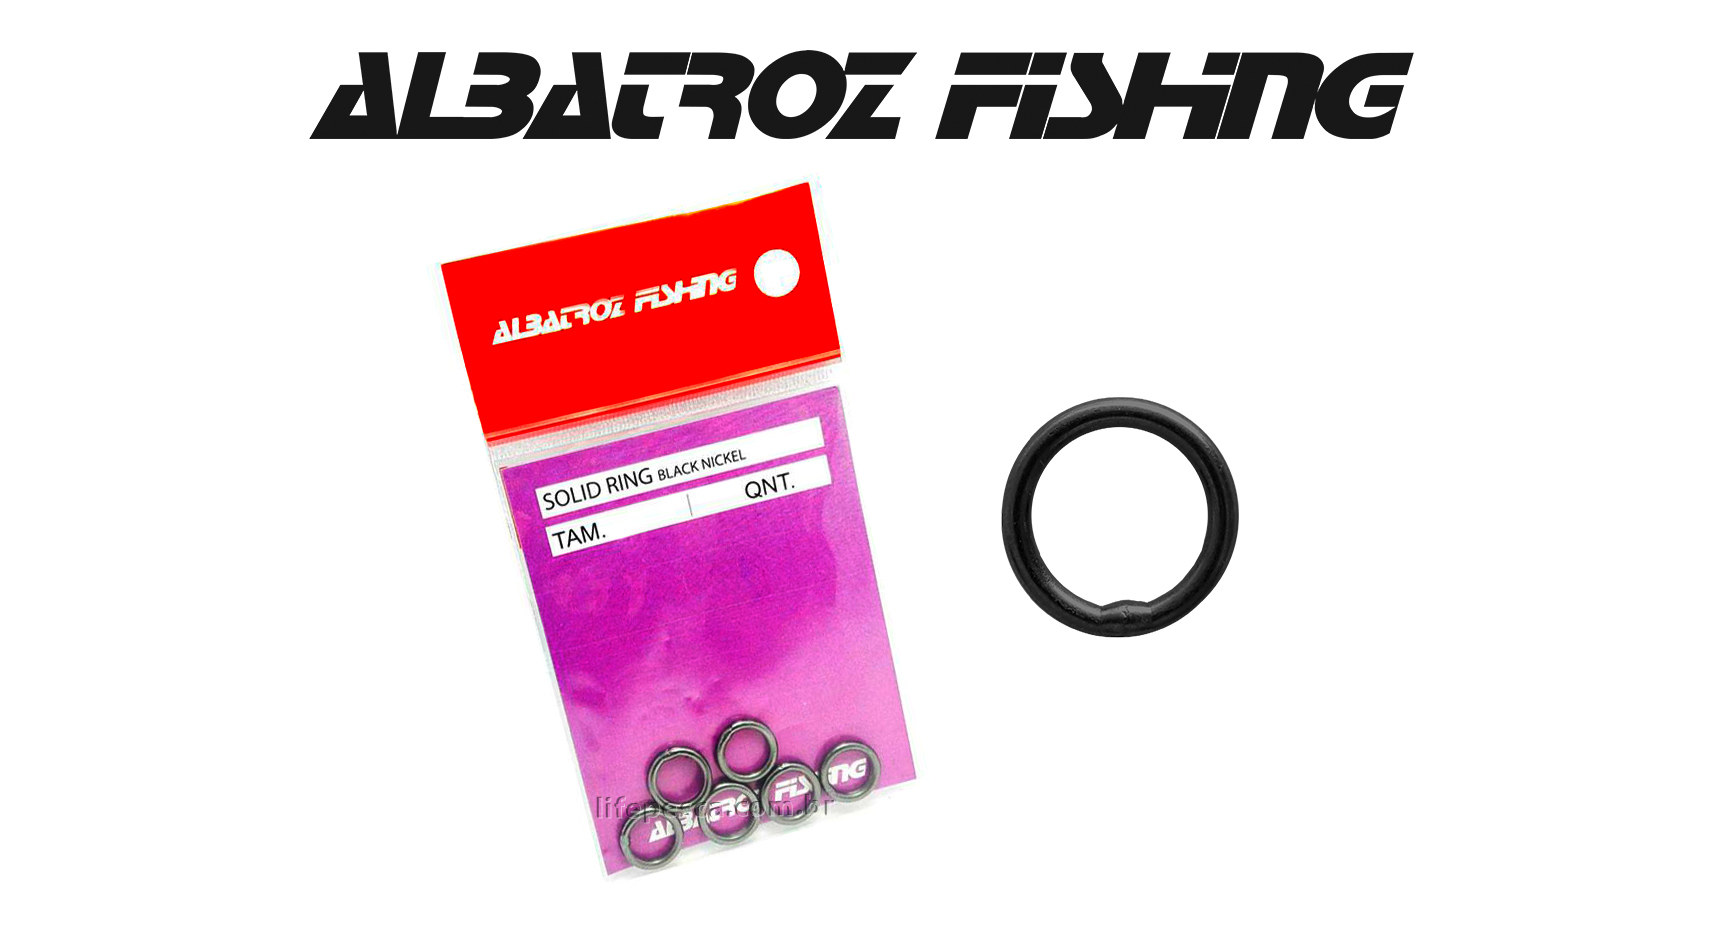 Girador Solid Ring Black Nickel N° 4 - Albatroz Fishing - 8 pçs